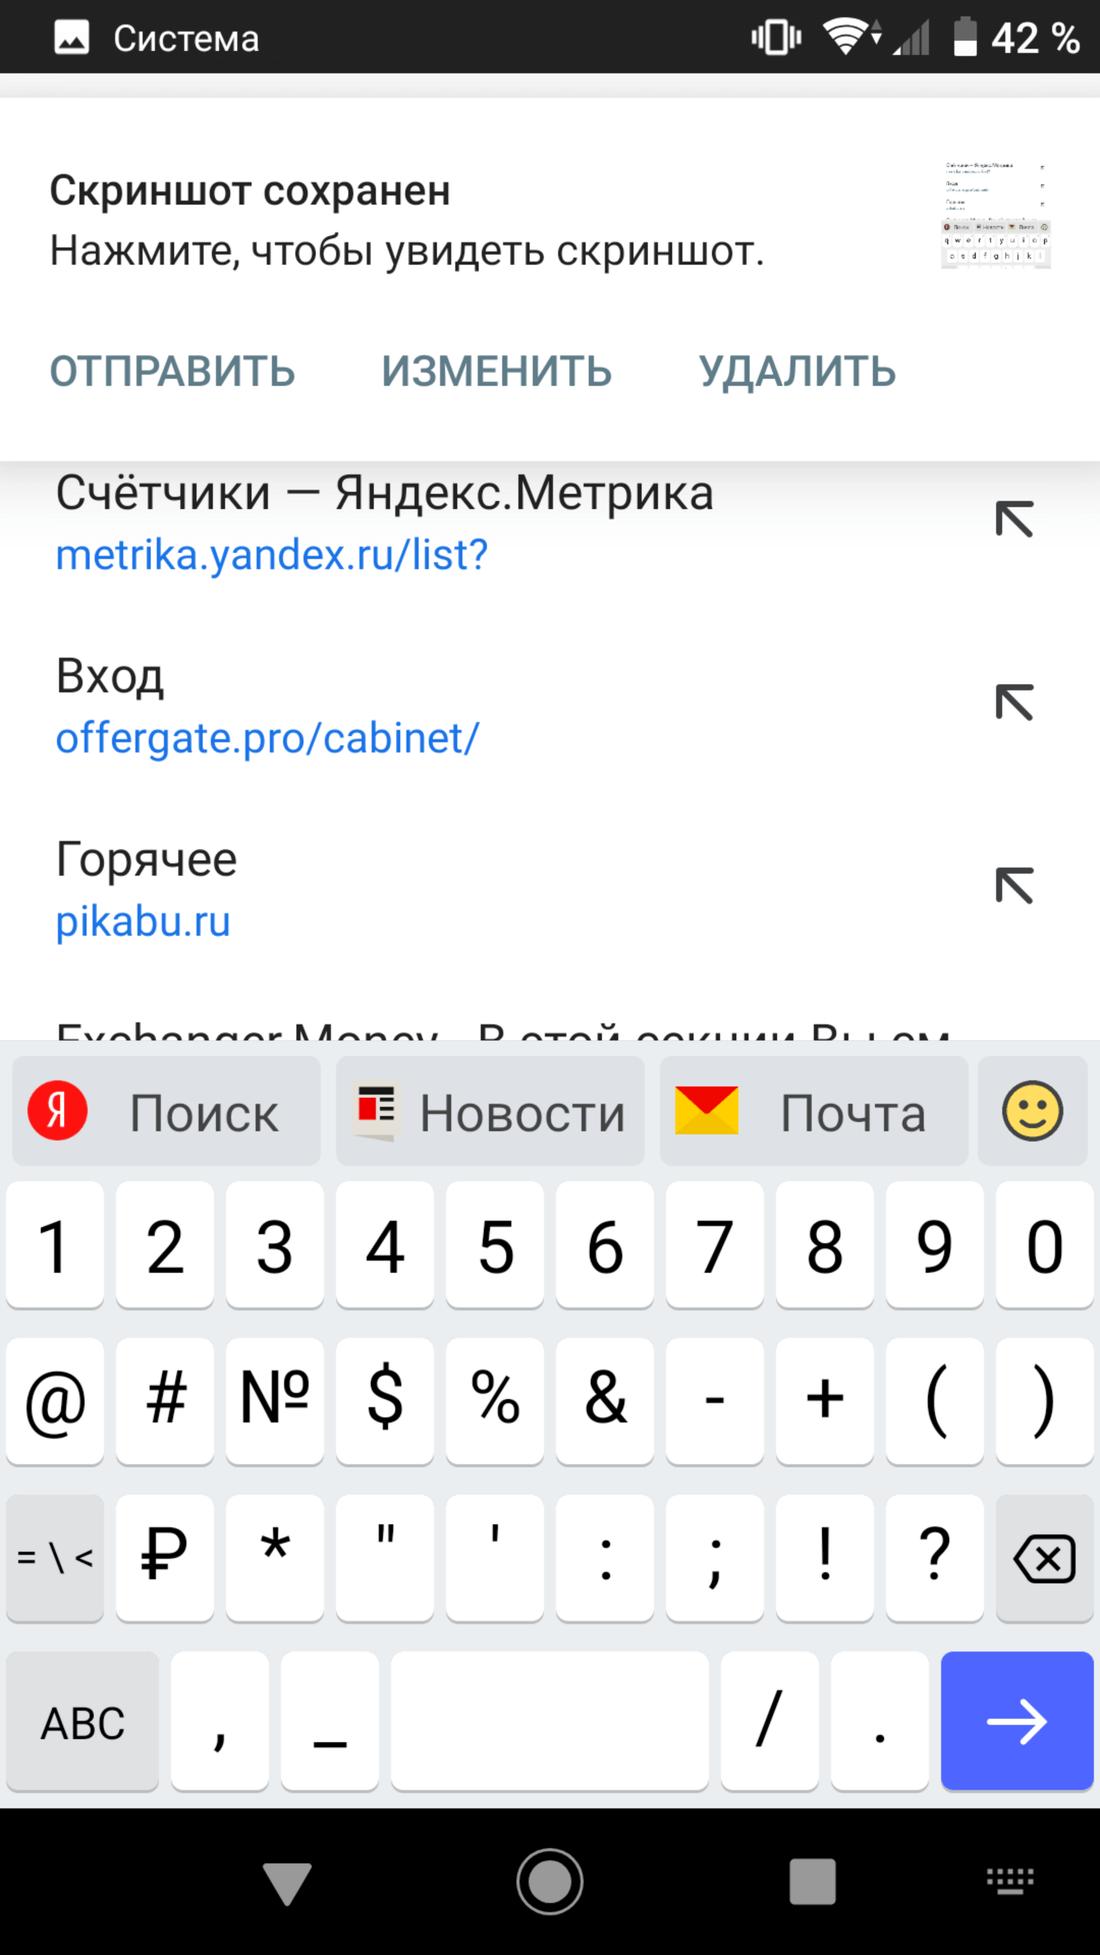 Скриншoт #3 из прoгрaммы Яндекc.Клaвиaтурa